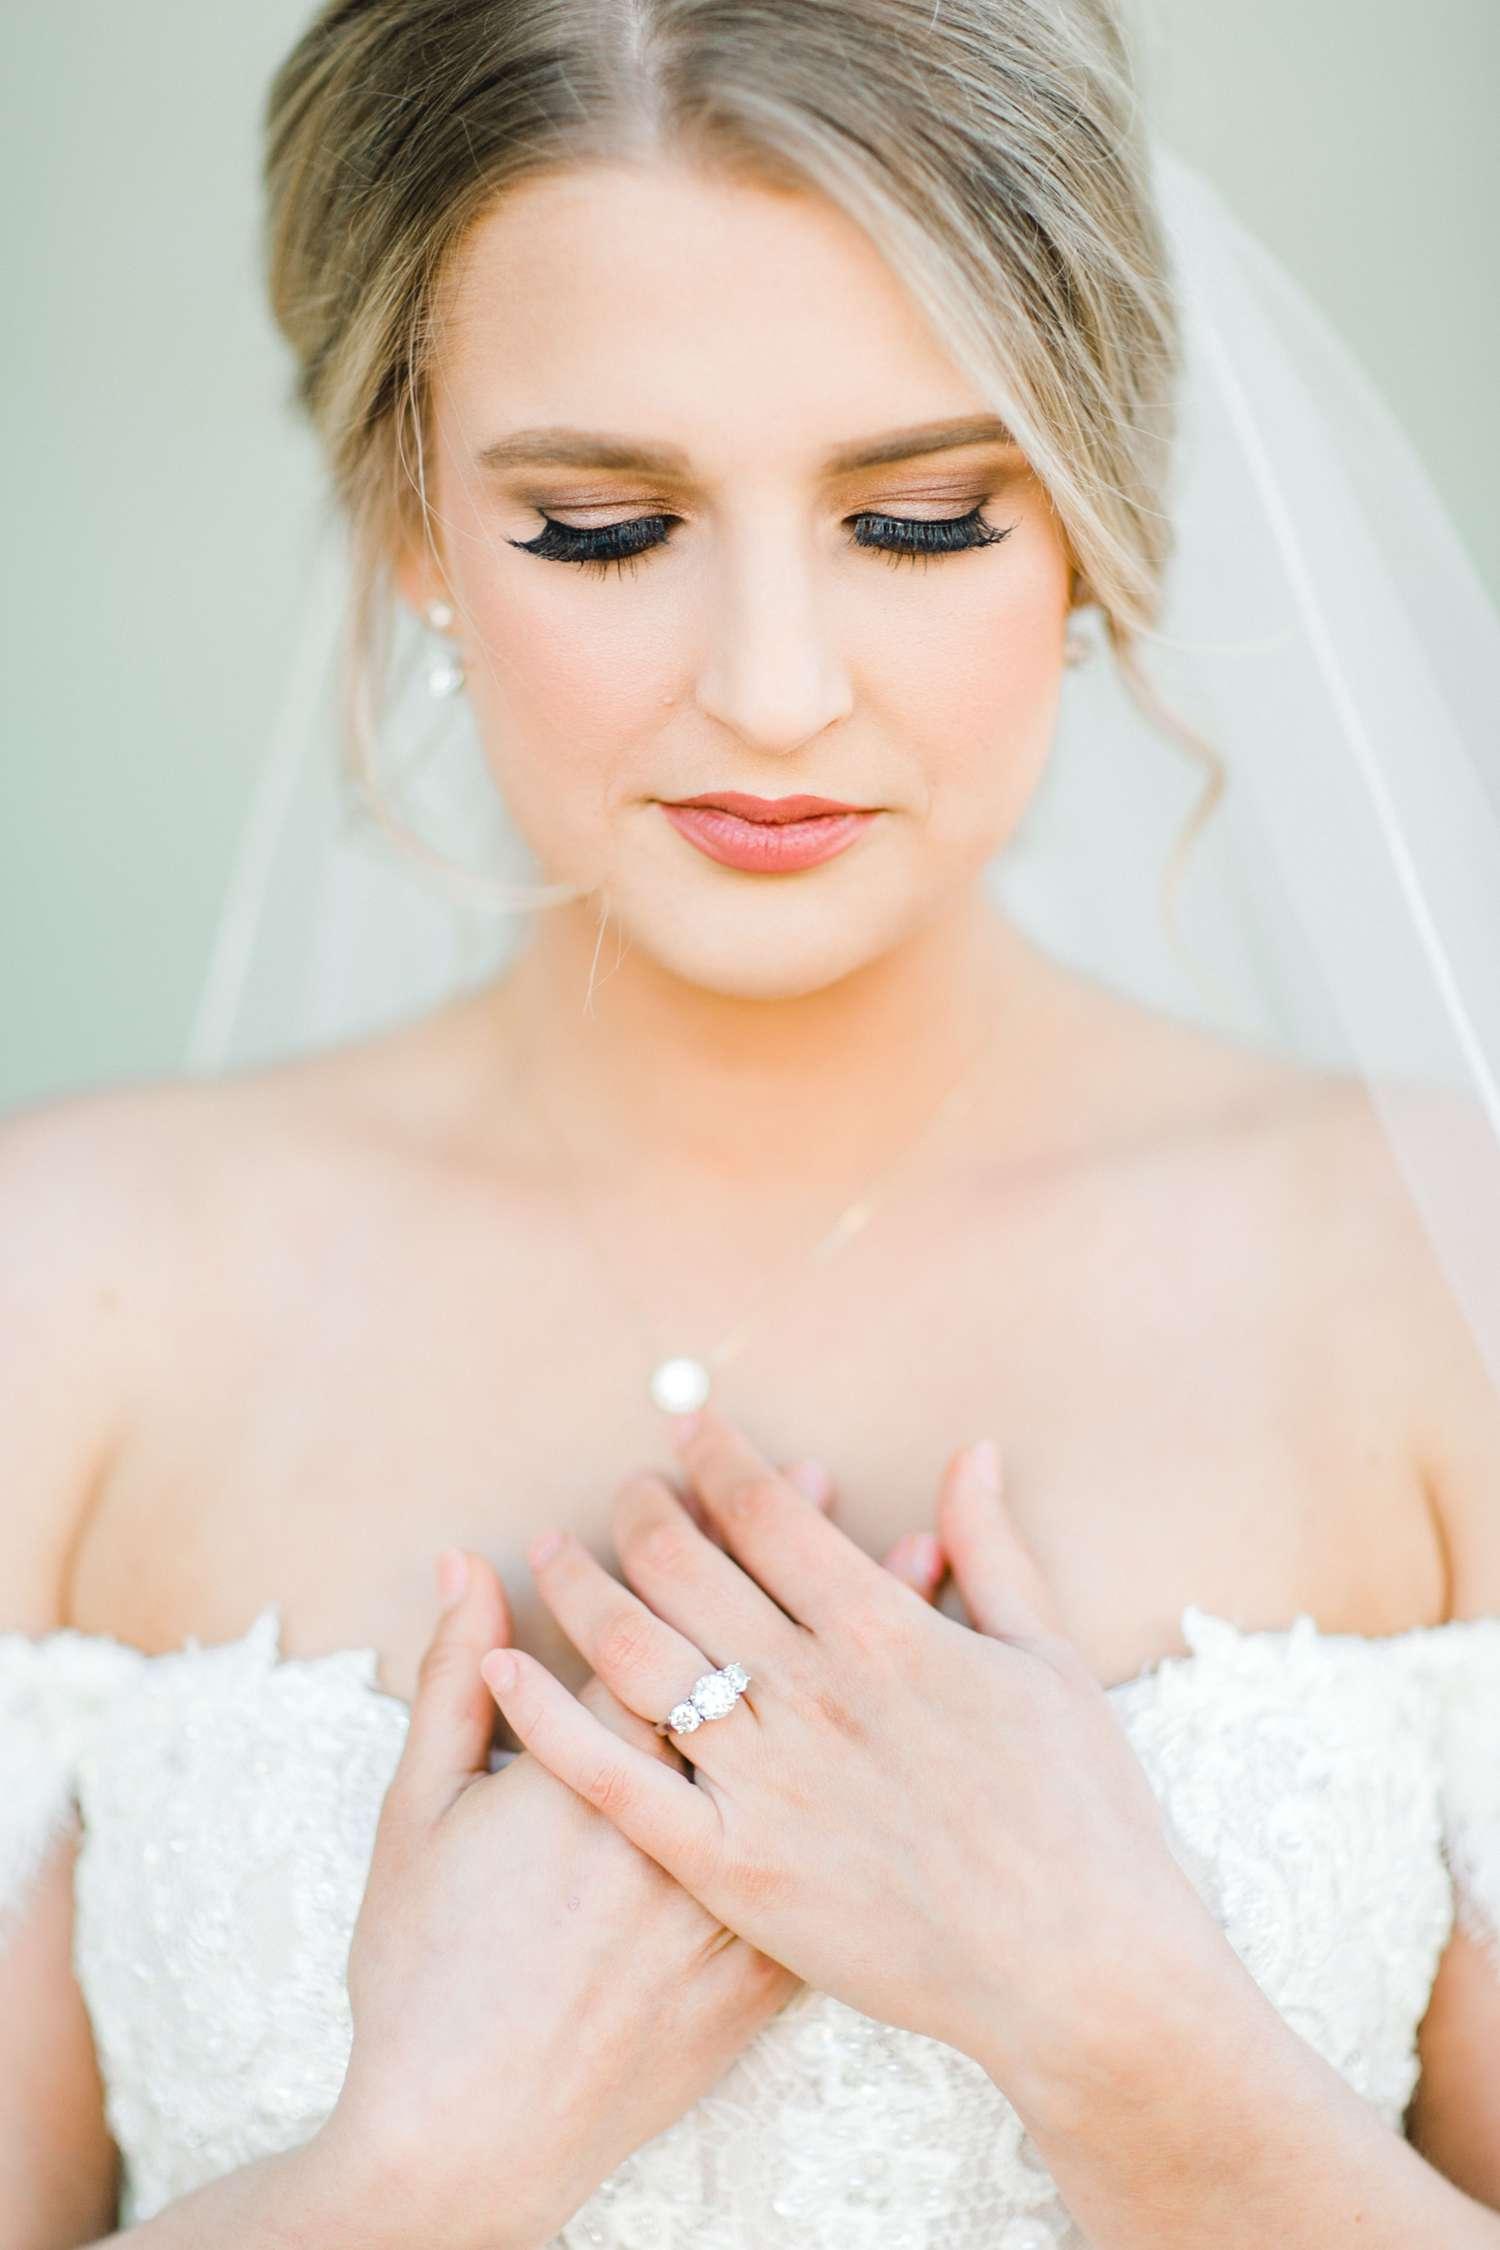 MORGAN+BOONE+BRIDALS+WEDDING+PHOTOGRAPHER_0027.jpg